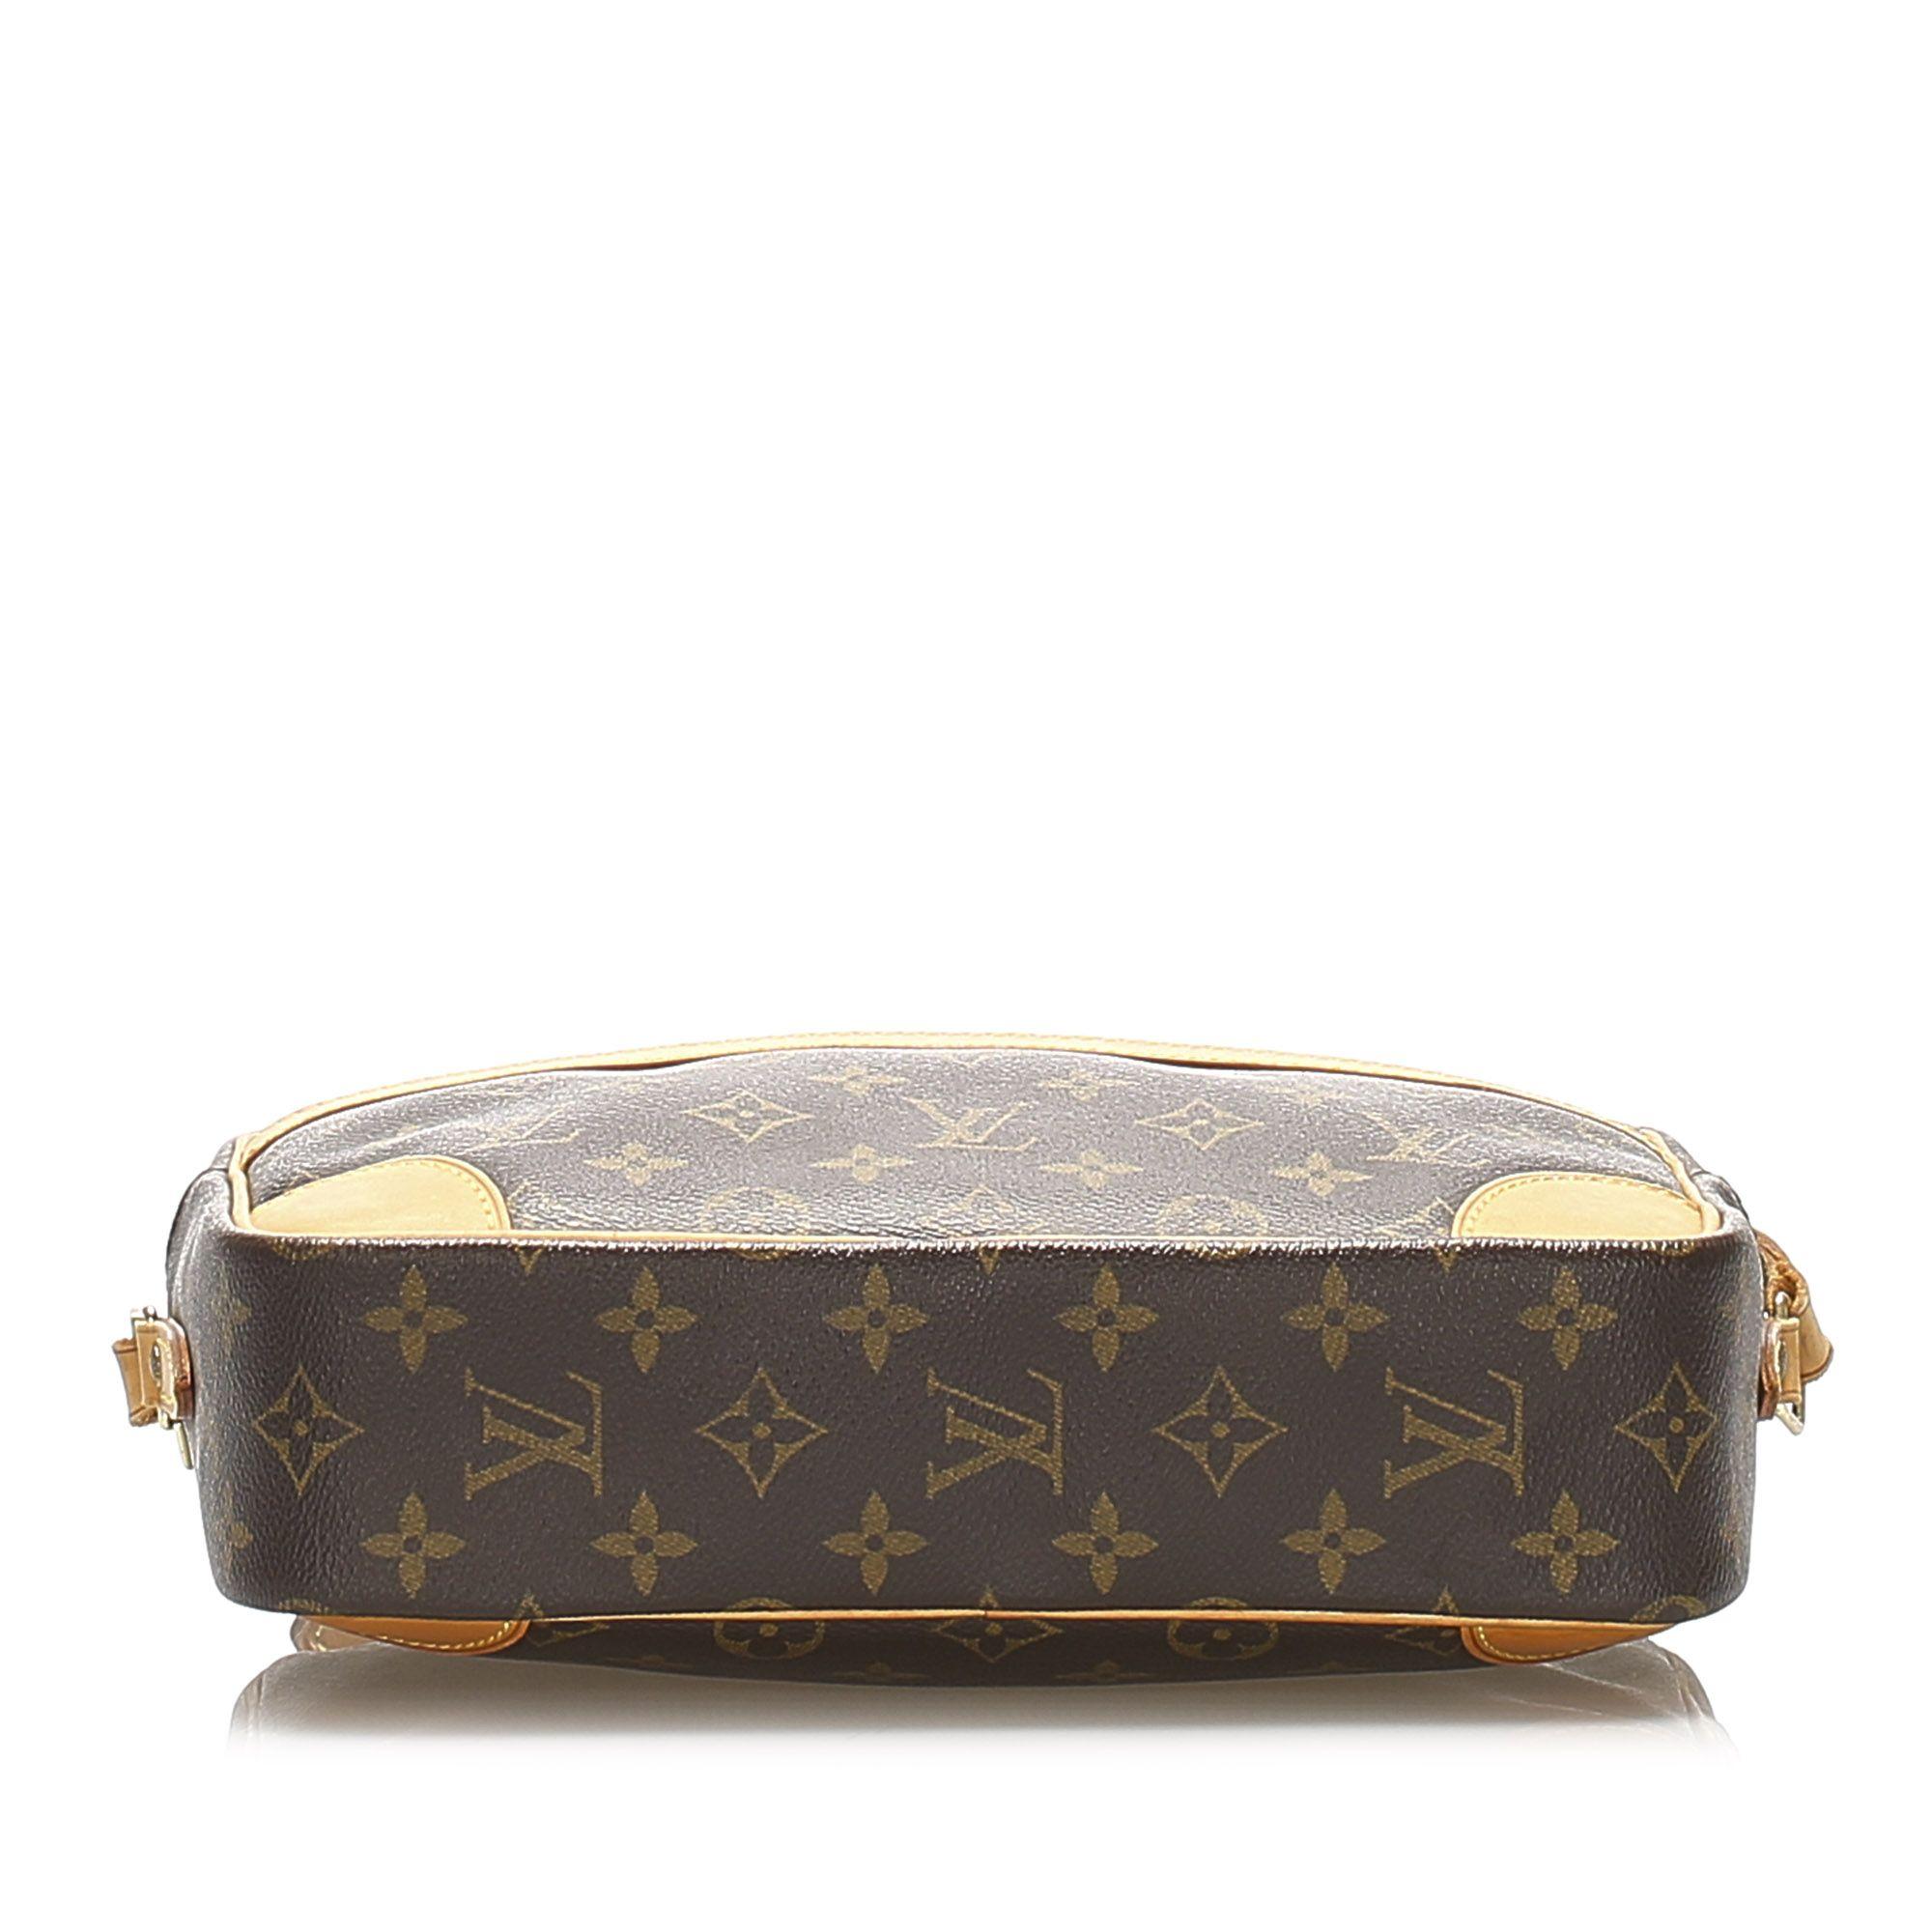 Vintage Louis Vuitton Monogram Trocadero 27 Brown